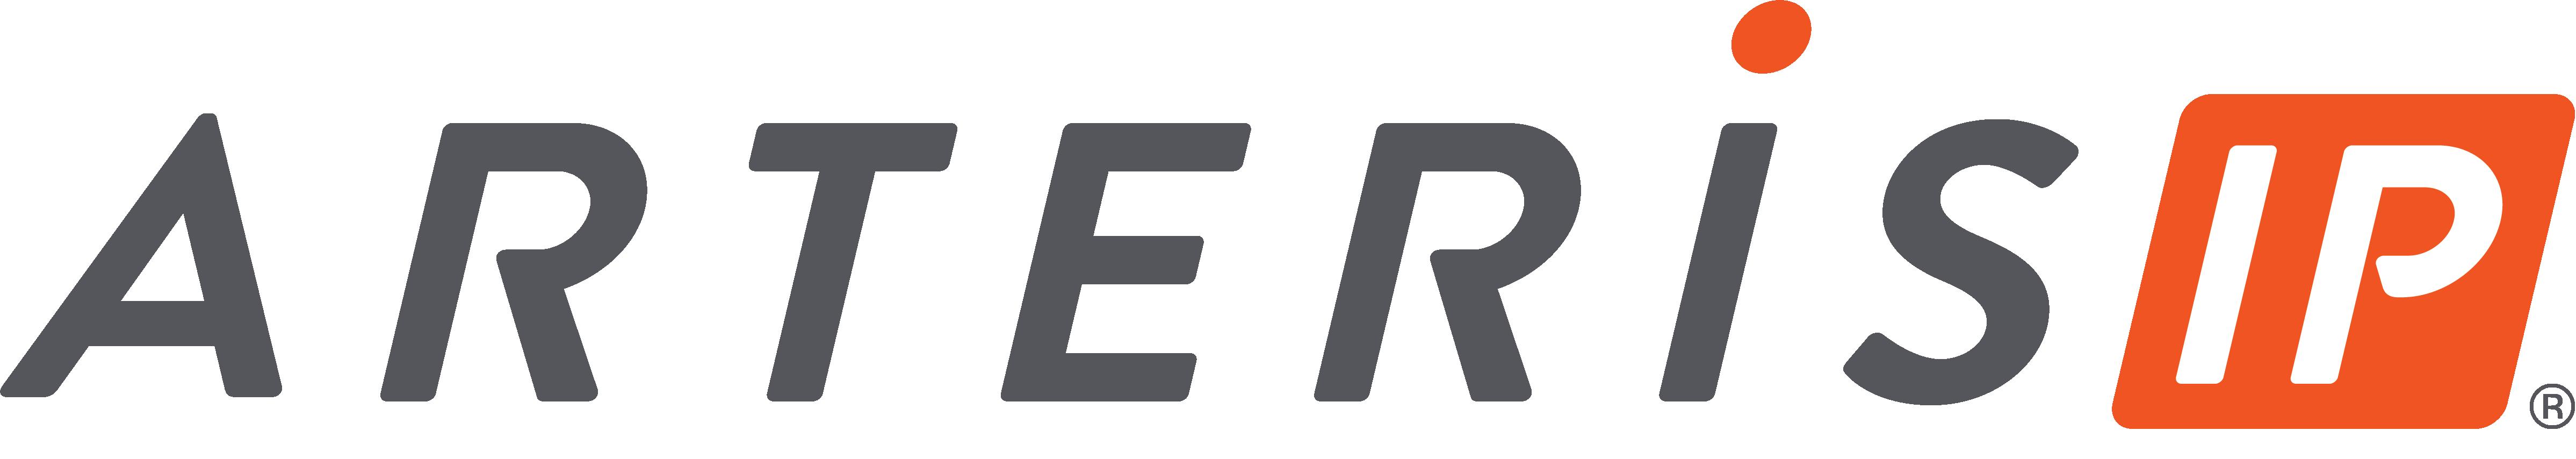 Arteris IP logo color trans 4795x854 1